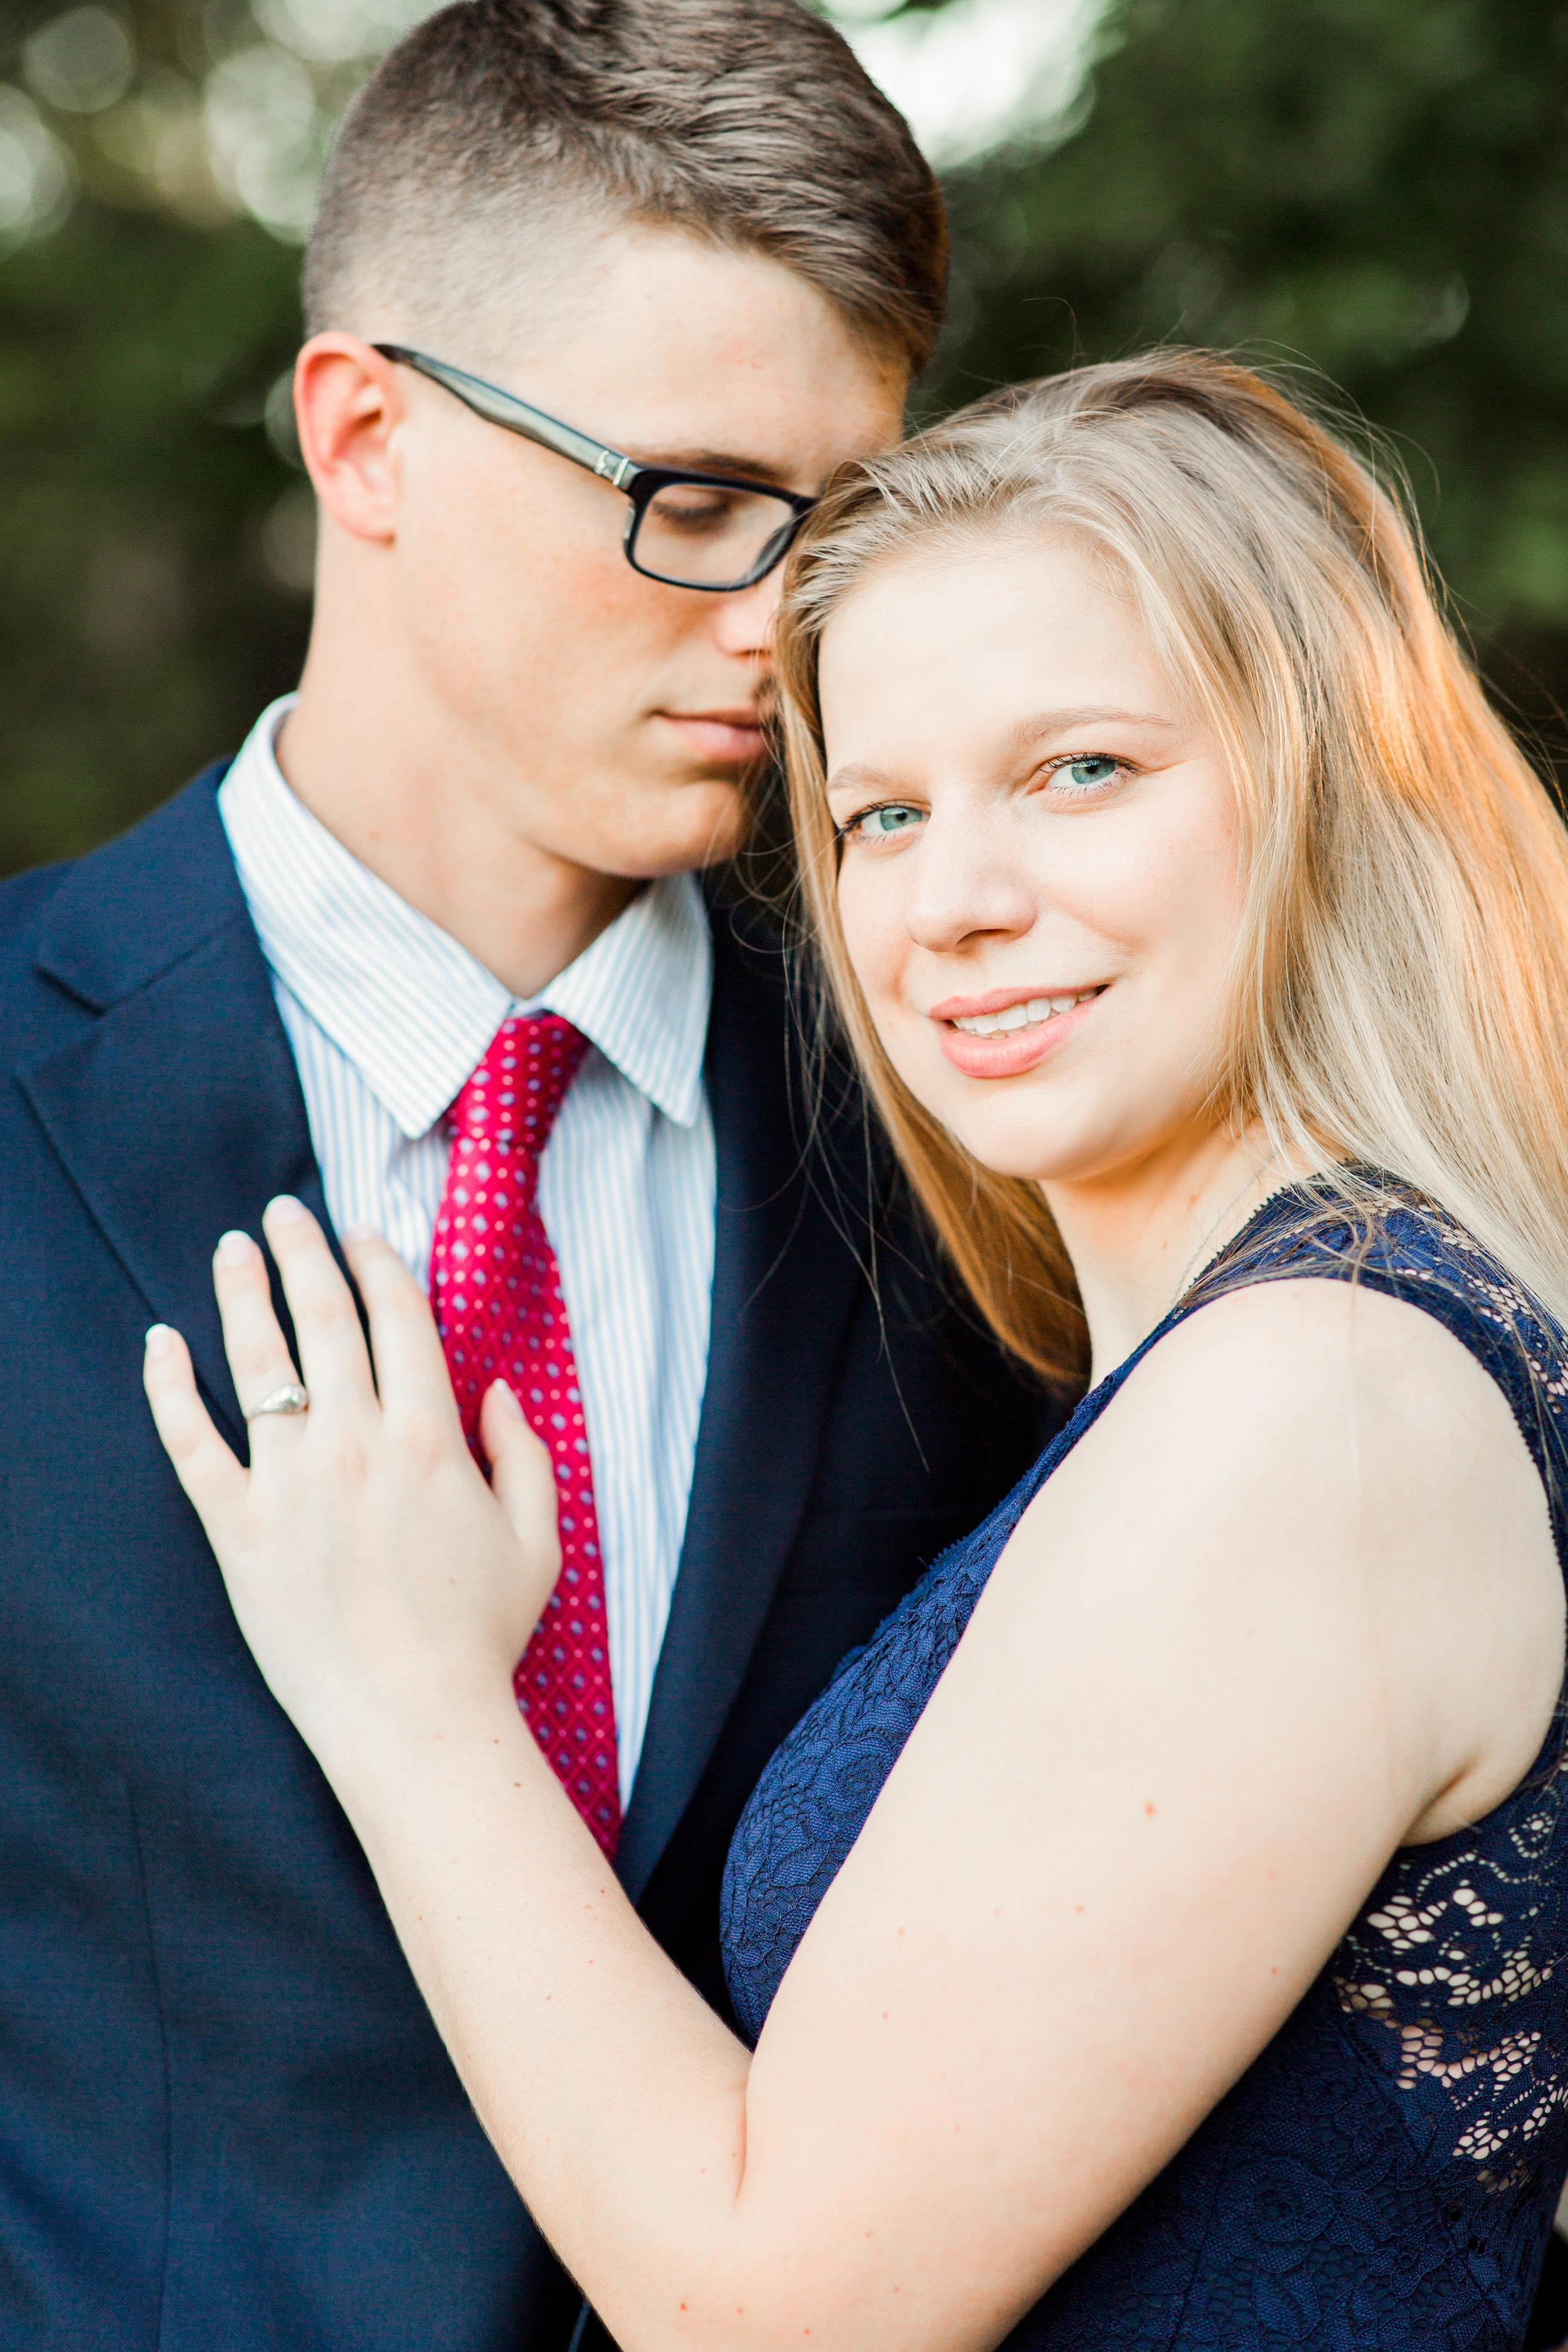 MaryElizabeth_Will_Engagement-103.JPG